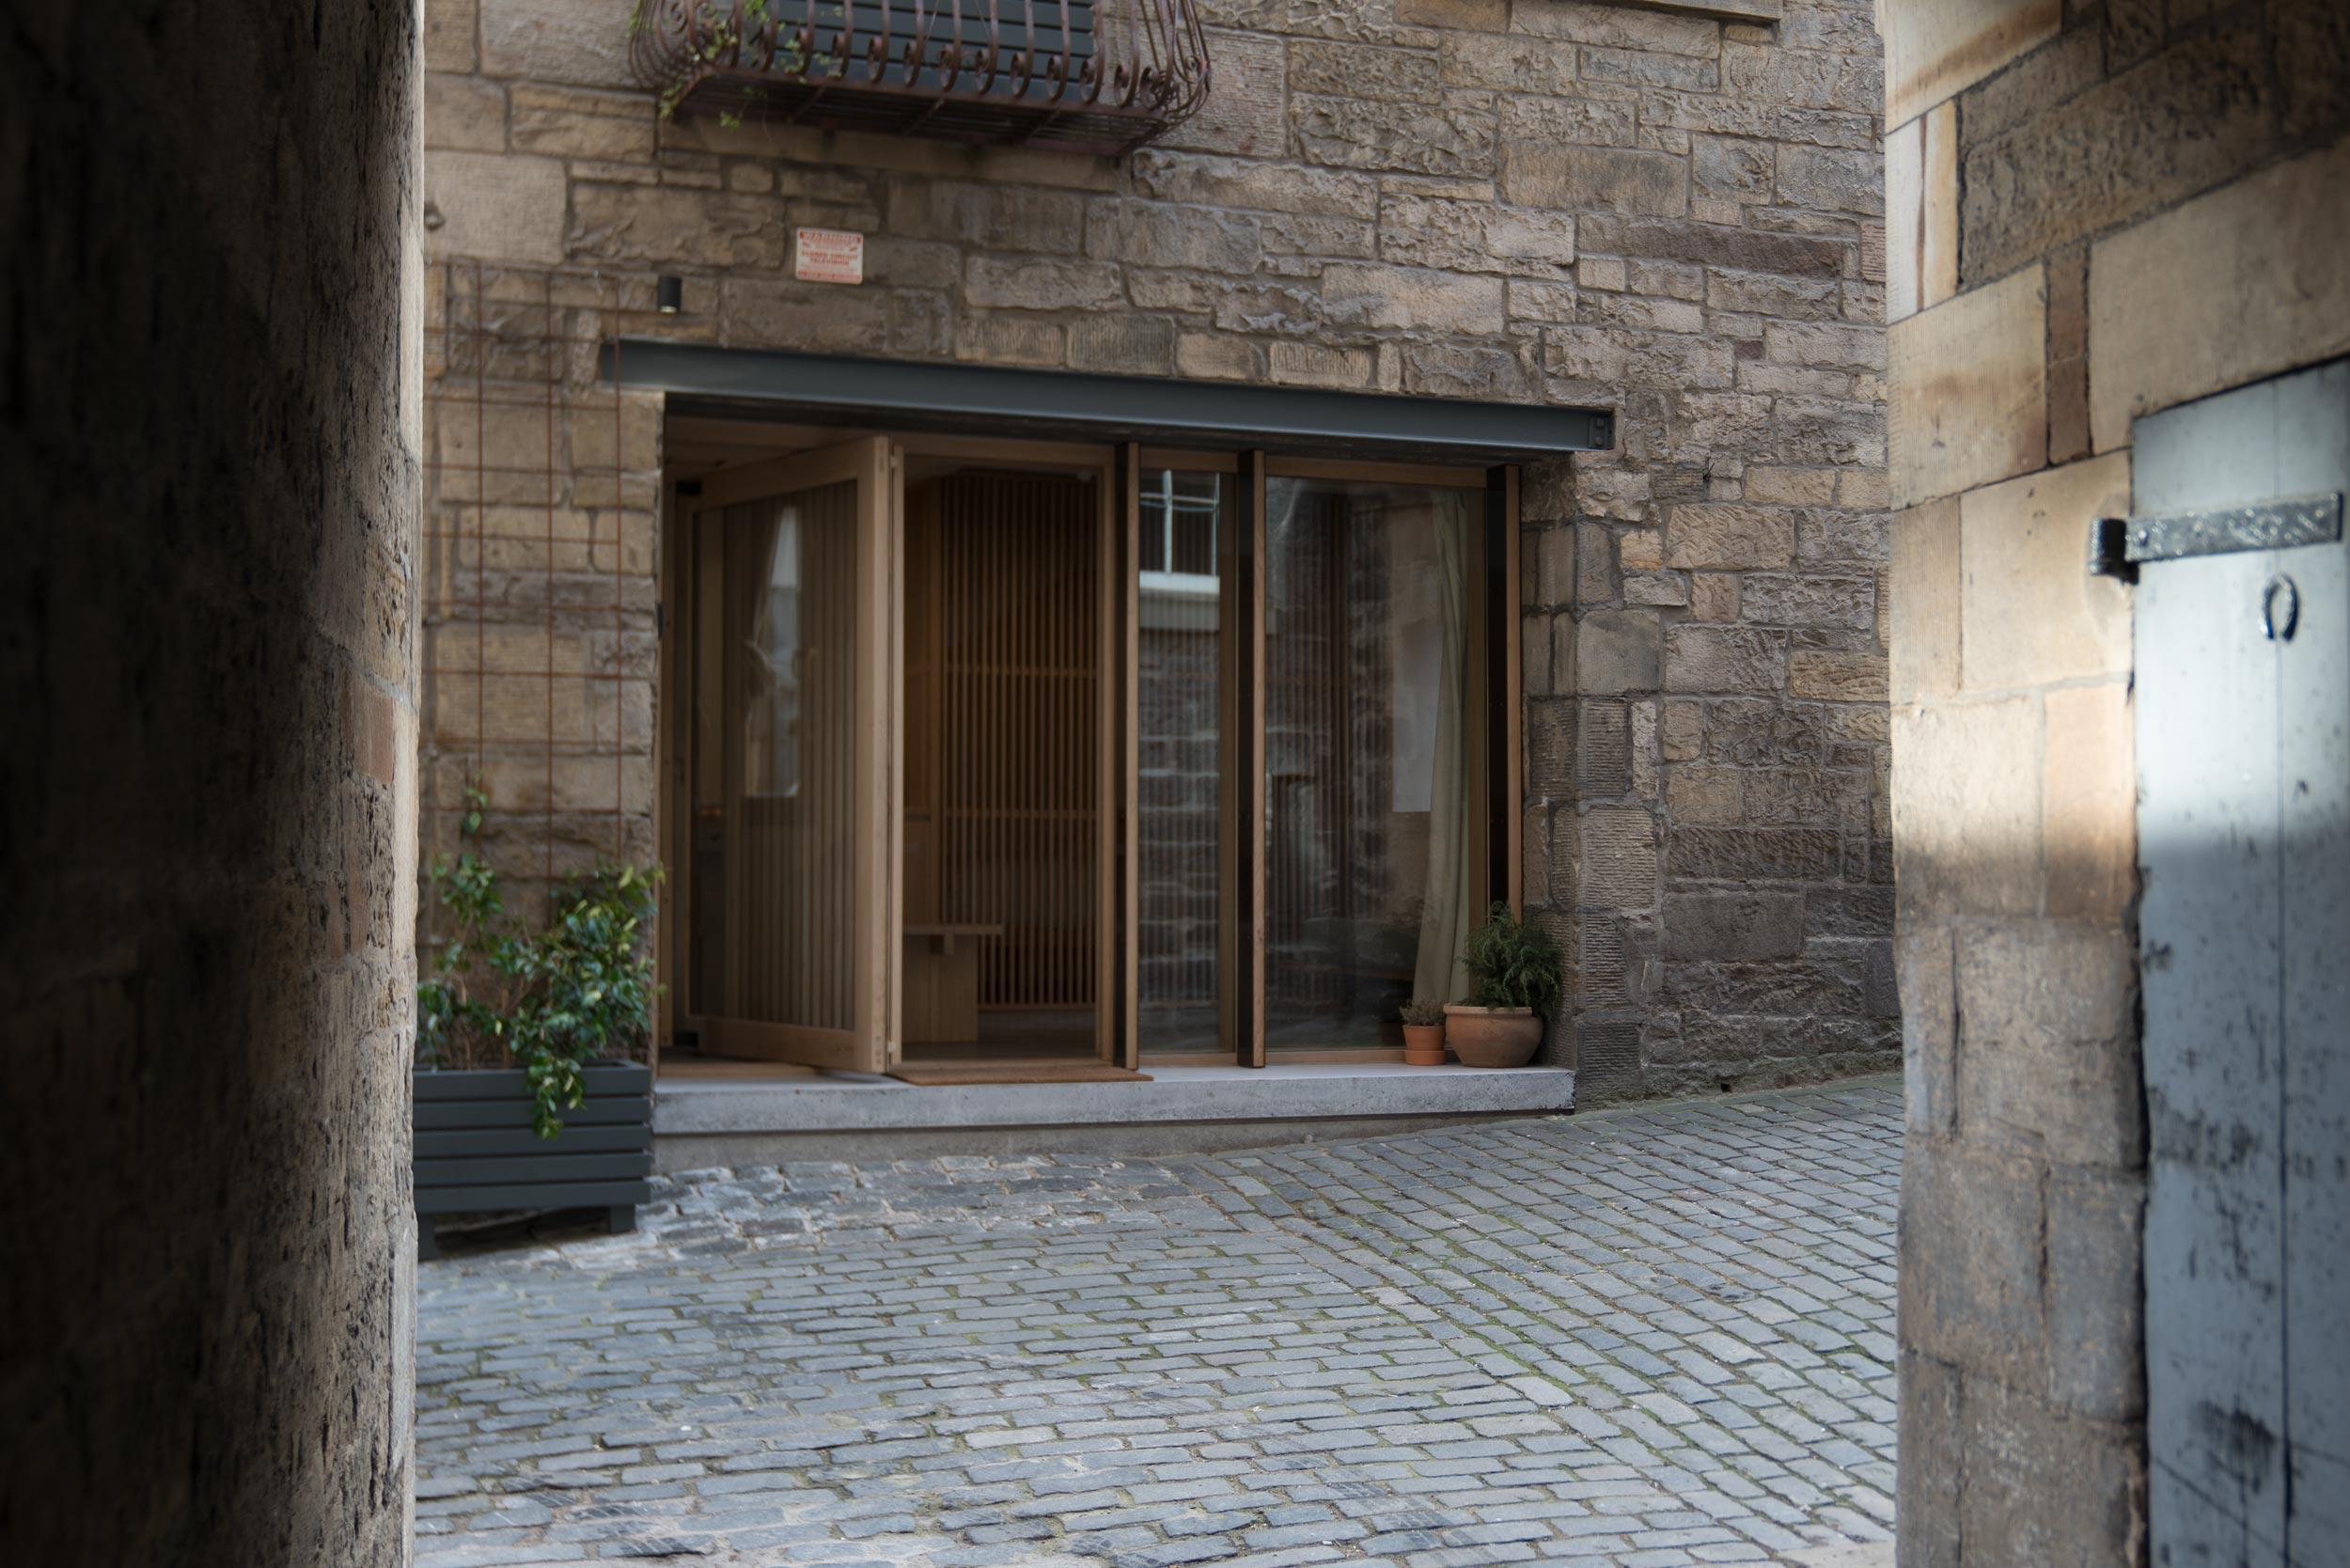 porteous-studio-fiona-burrage-photographer-norwich-edinburgh-exterior.jpg